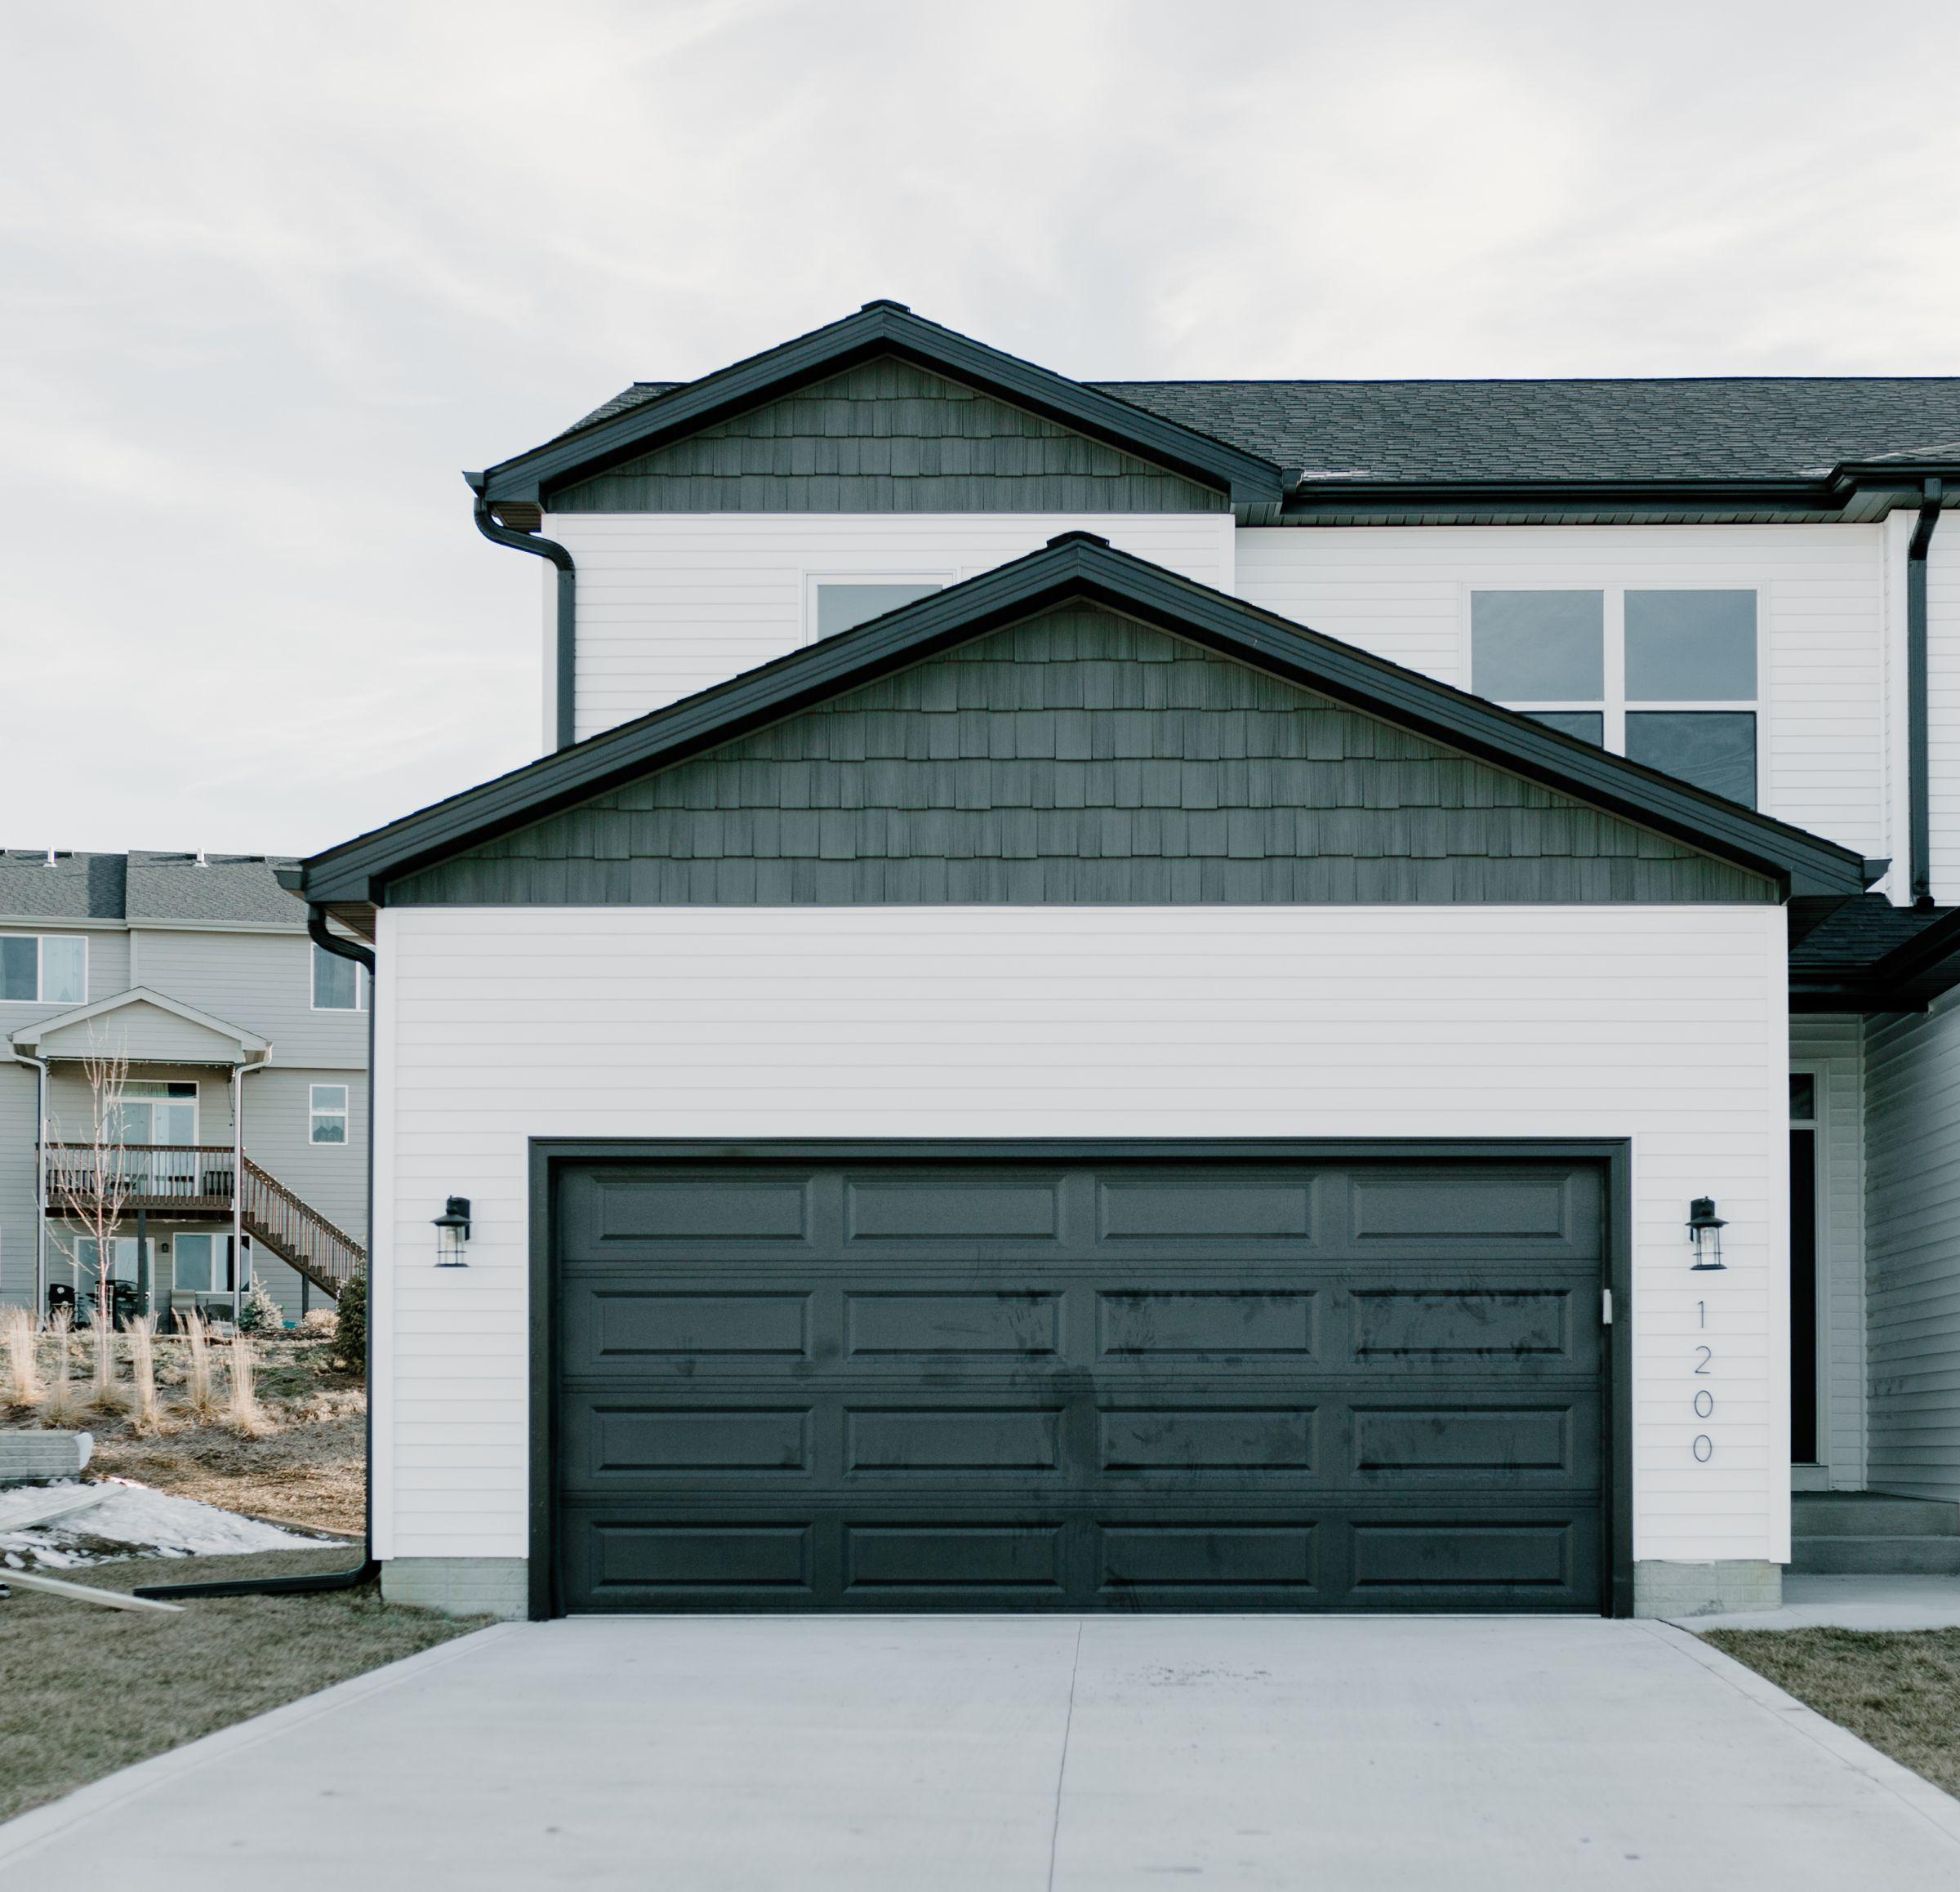 residential-warren-county-iowa-0-acres-listing-number-15140-8-2020-12-28-165306.jpg